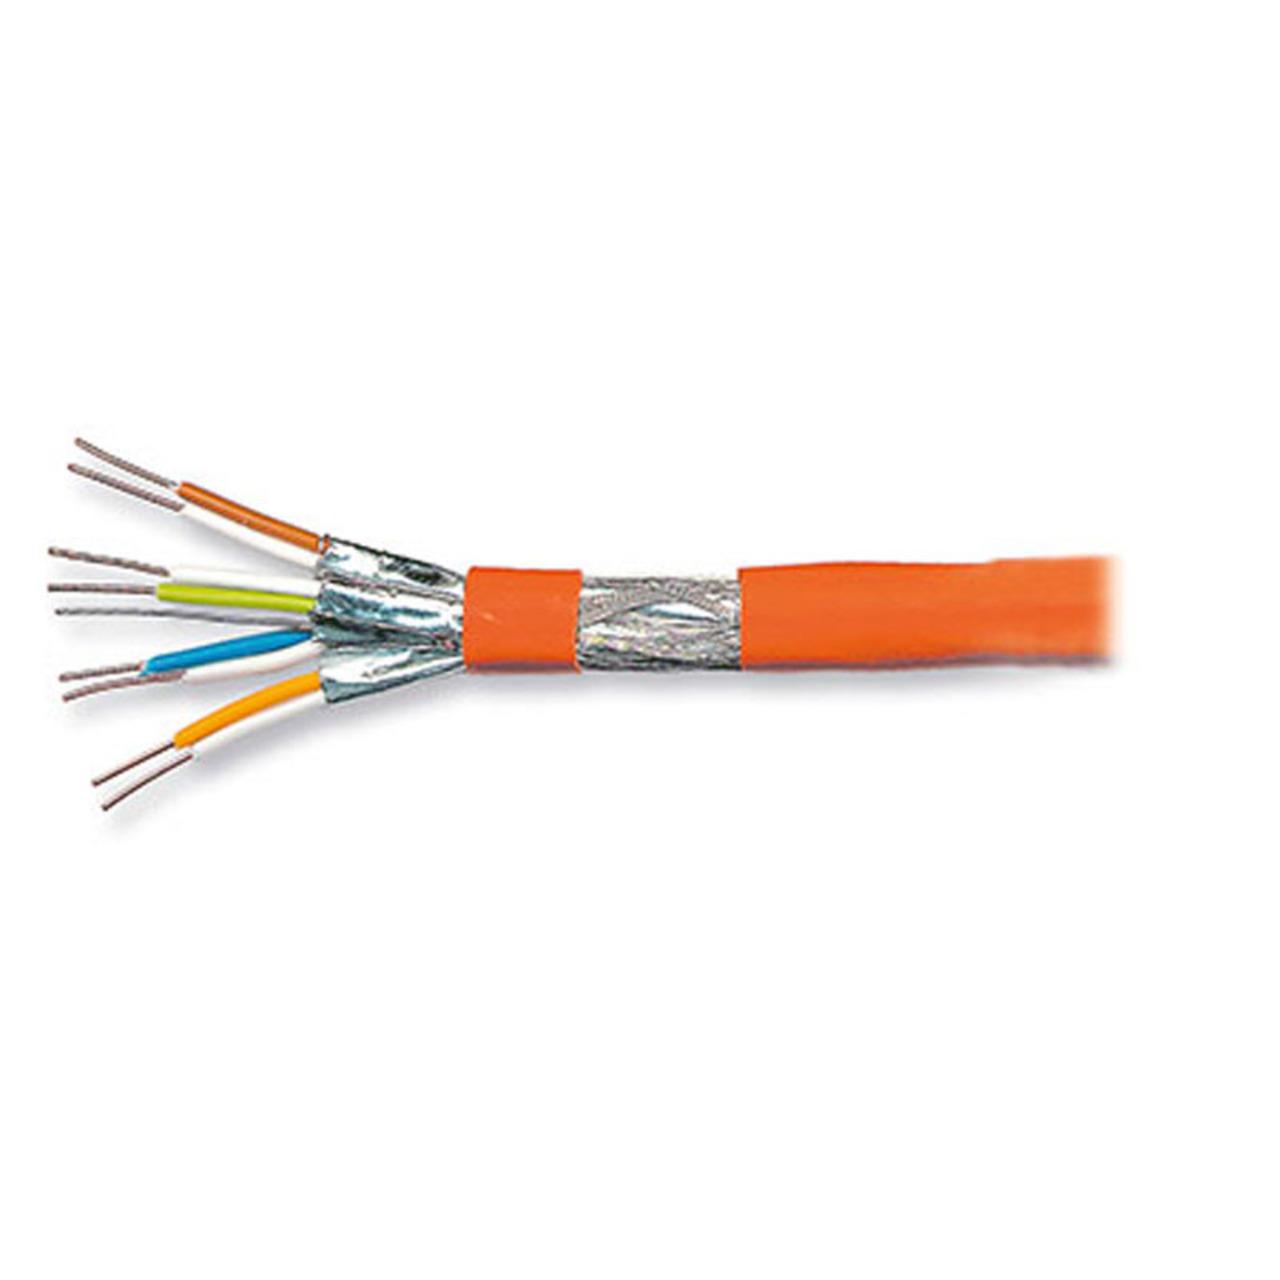 EFB-Elektronik Verlegekabel- Cat- 7 Rohkabel- Typ PIMF 4 x 2 x 0-56- 100 m